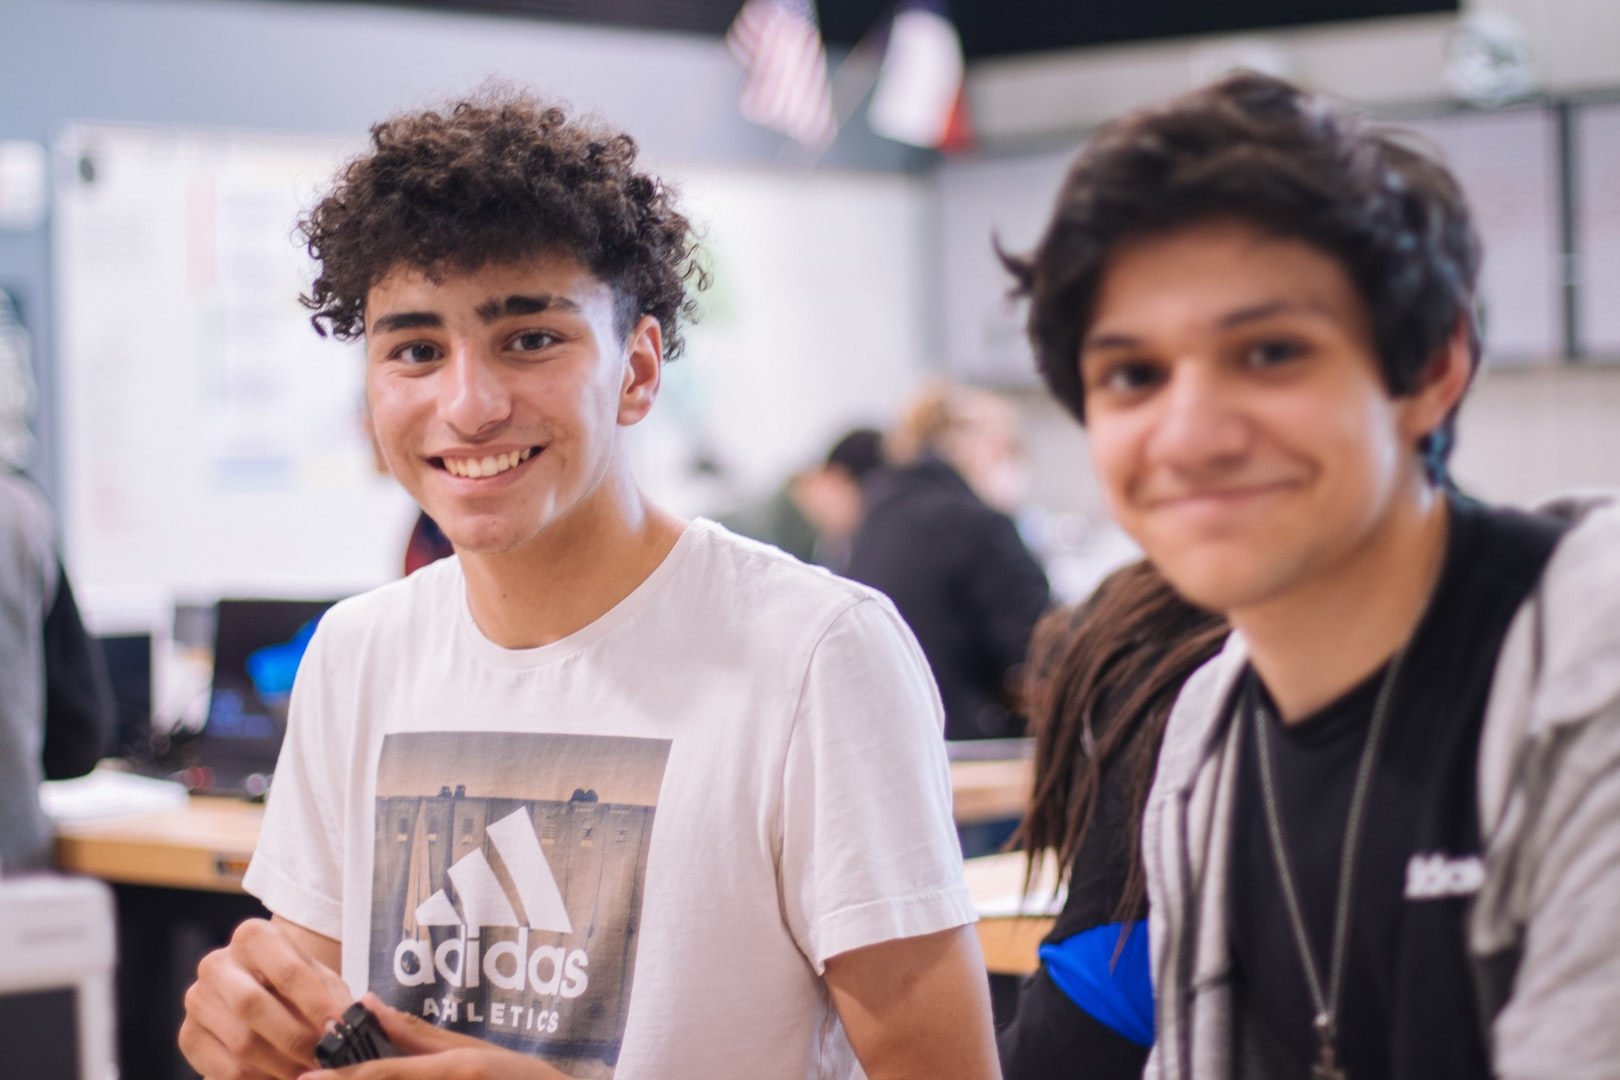 Two teenage boys smiling